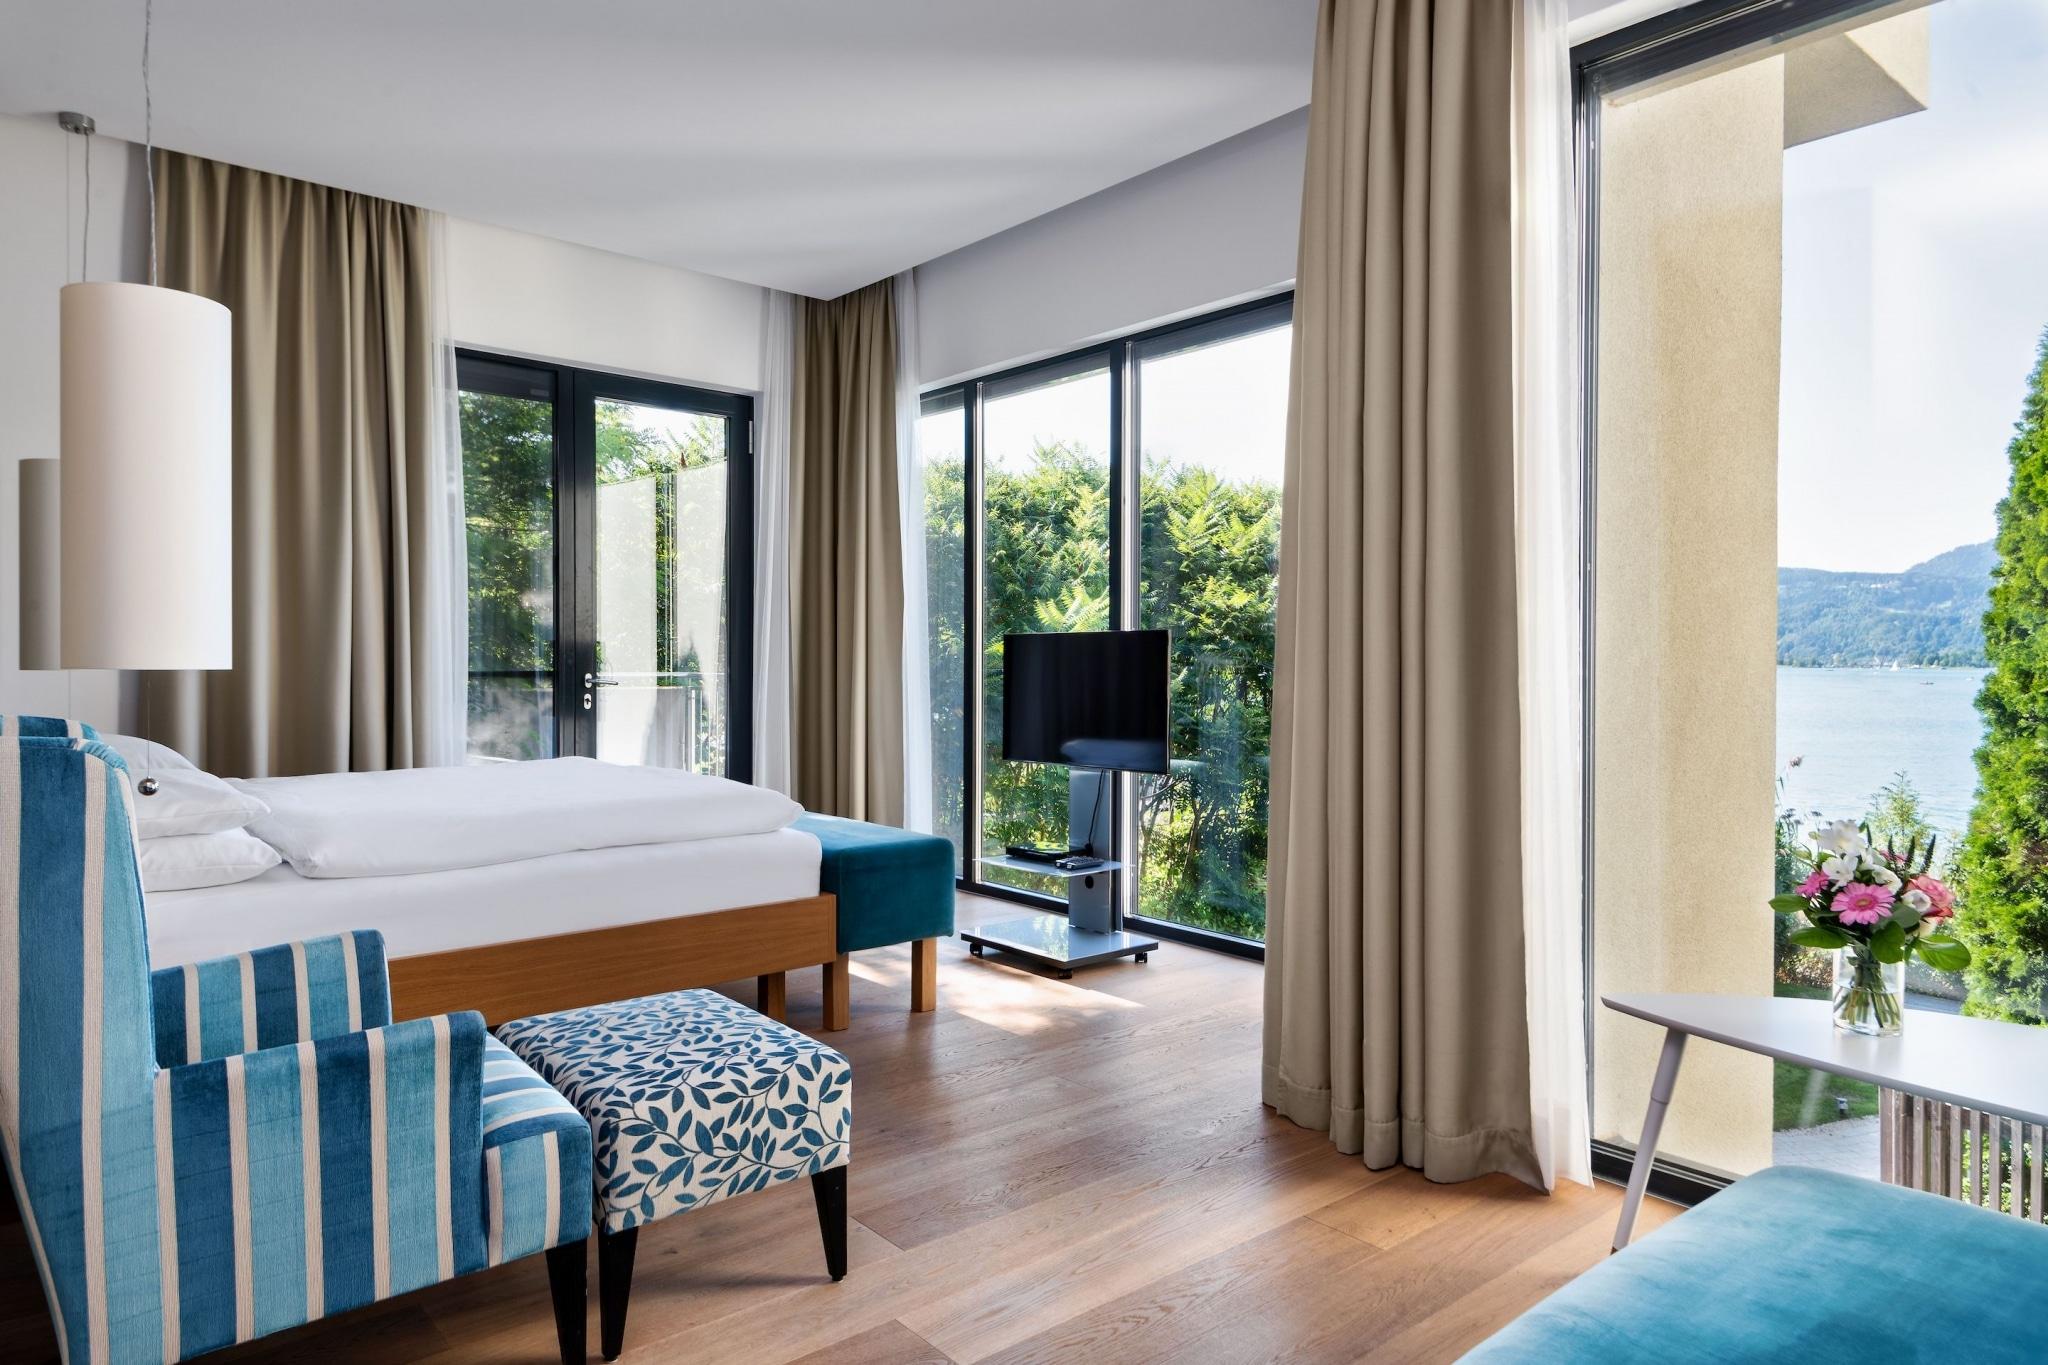 luxurious bedroom with many windows of a villa at VIVAMAYR Maria Wörth